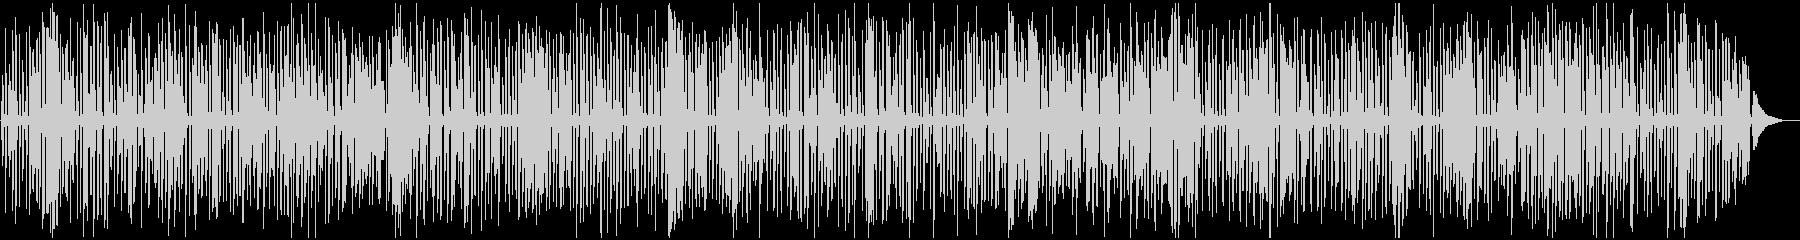 YouTube、楽しいレトロジャズピアノの未再生の波形